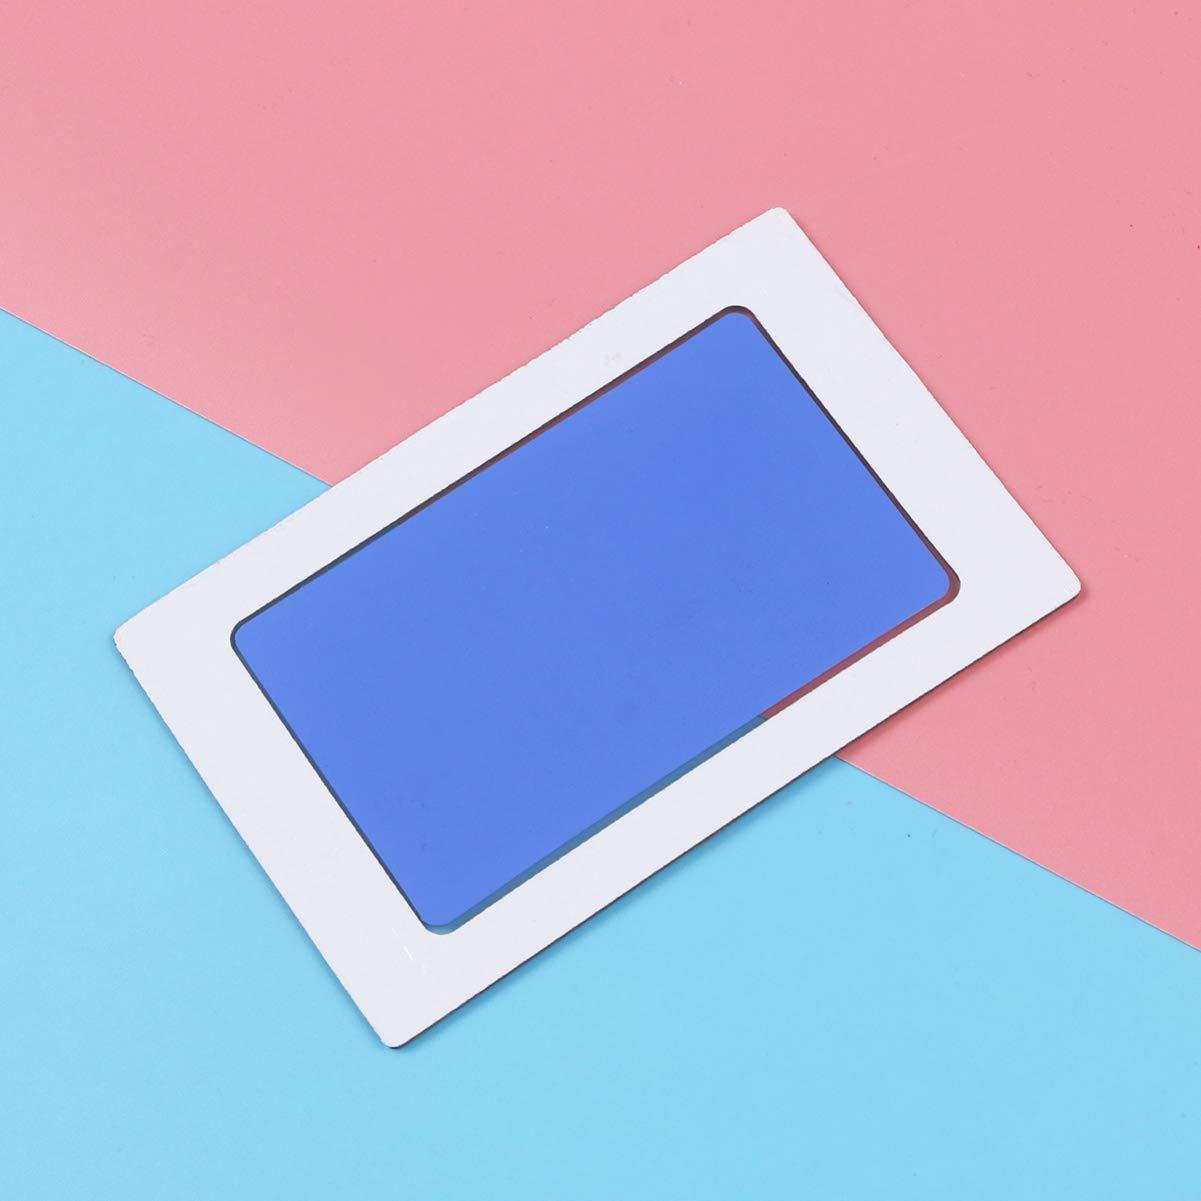 Toyvian regalo de kit de impresi/ón segura de almohadilla de tinta de huella de mano de beb/é para beb/é y mascotas azul cielo